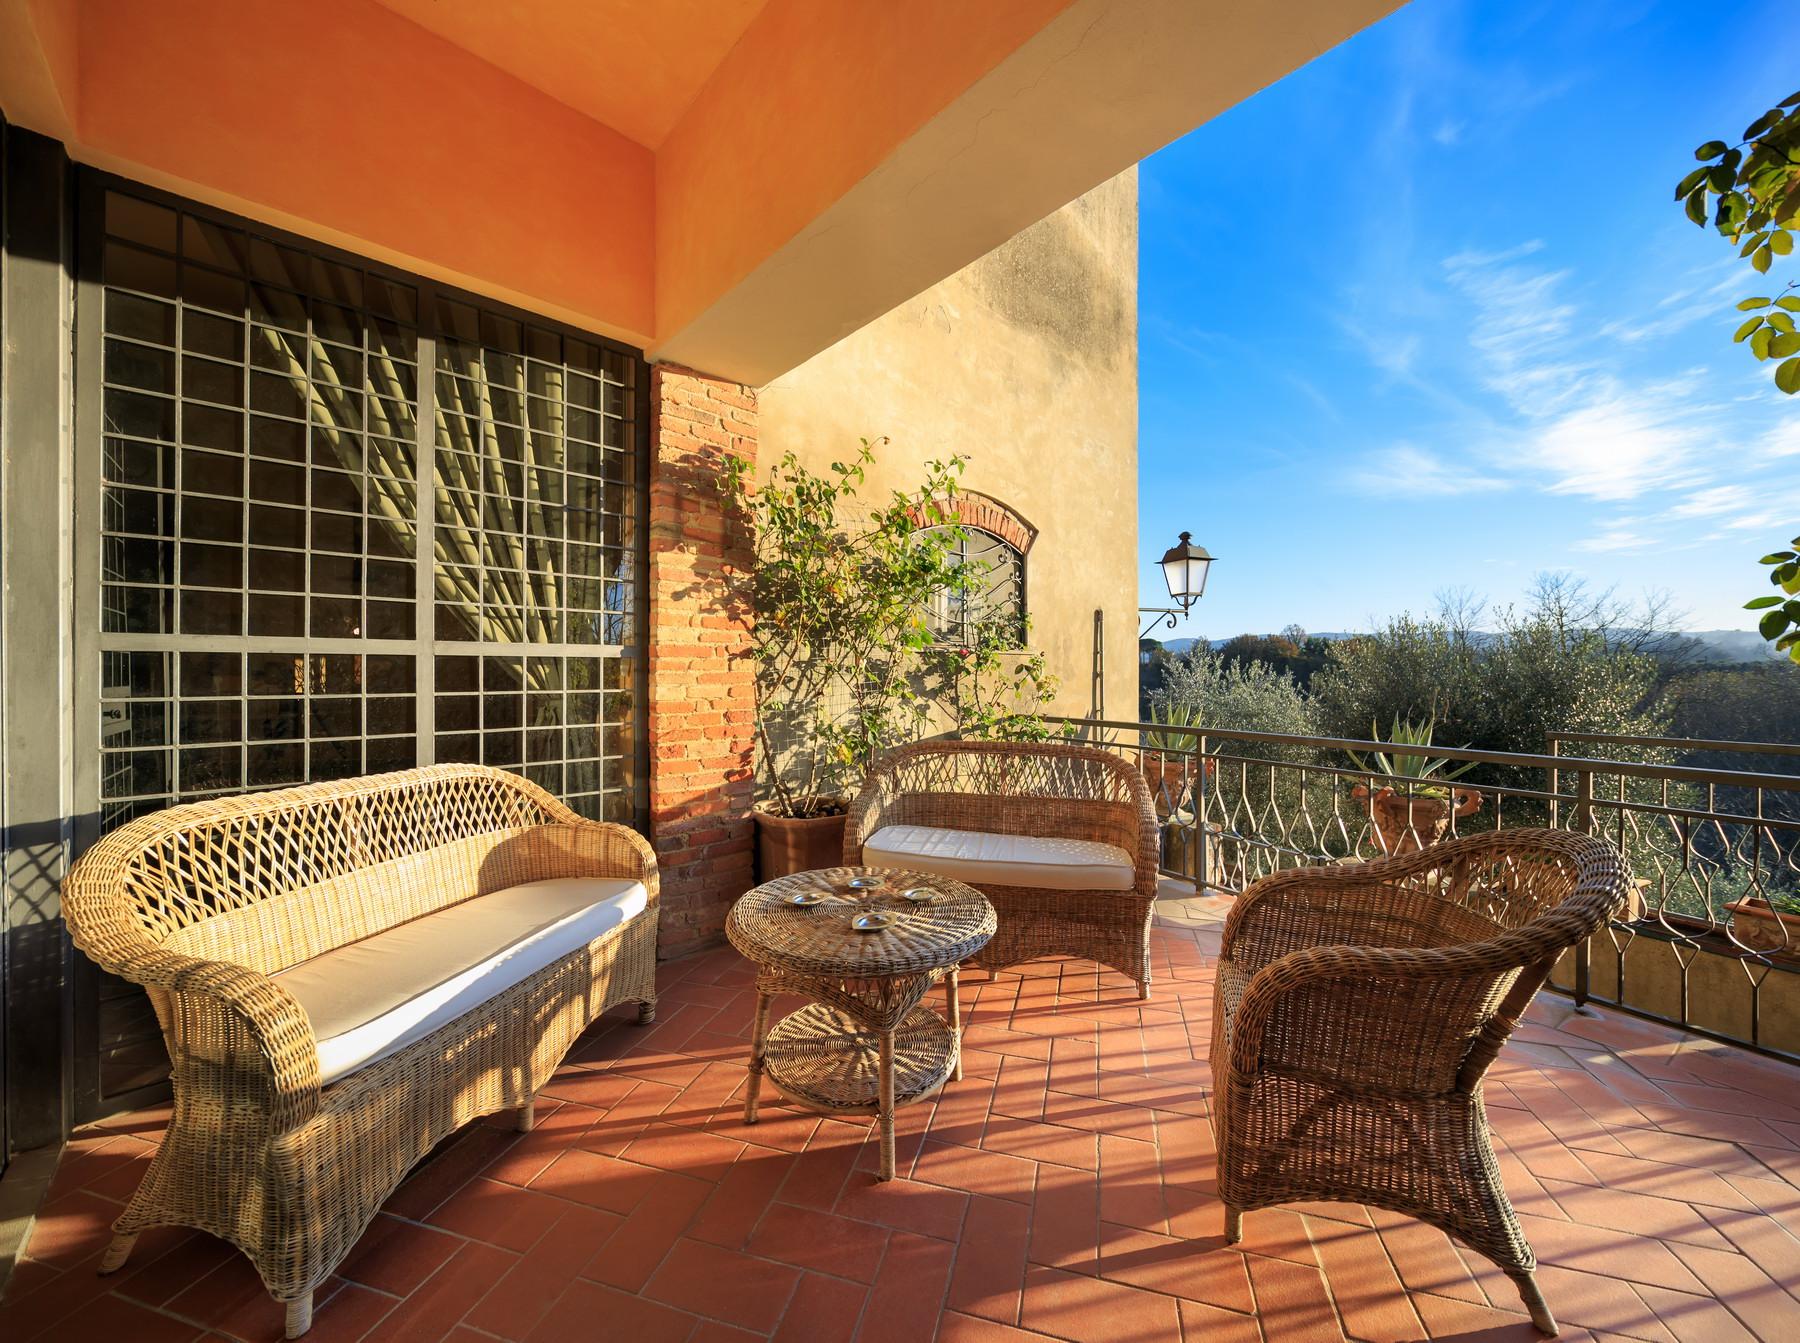 Villa in Vendita a Casciana Terme Lari: 5 locali, 550 mq - Foto 7